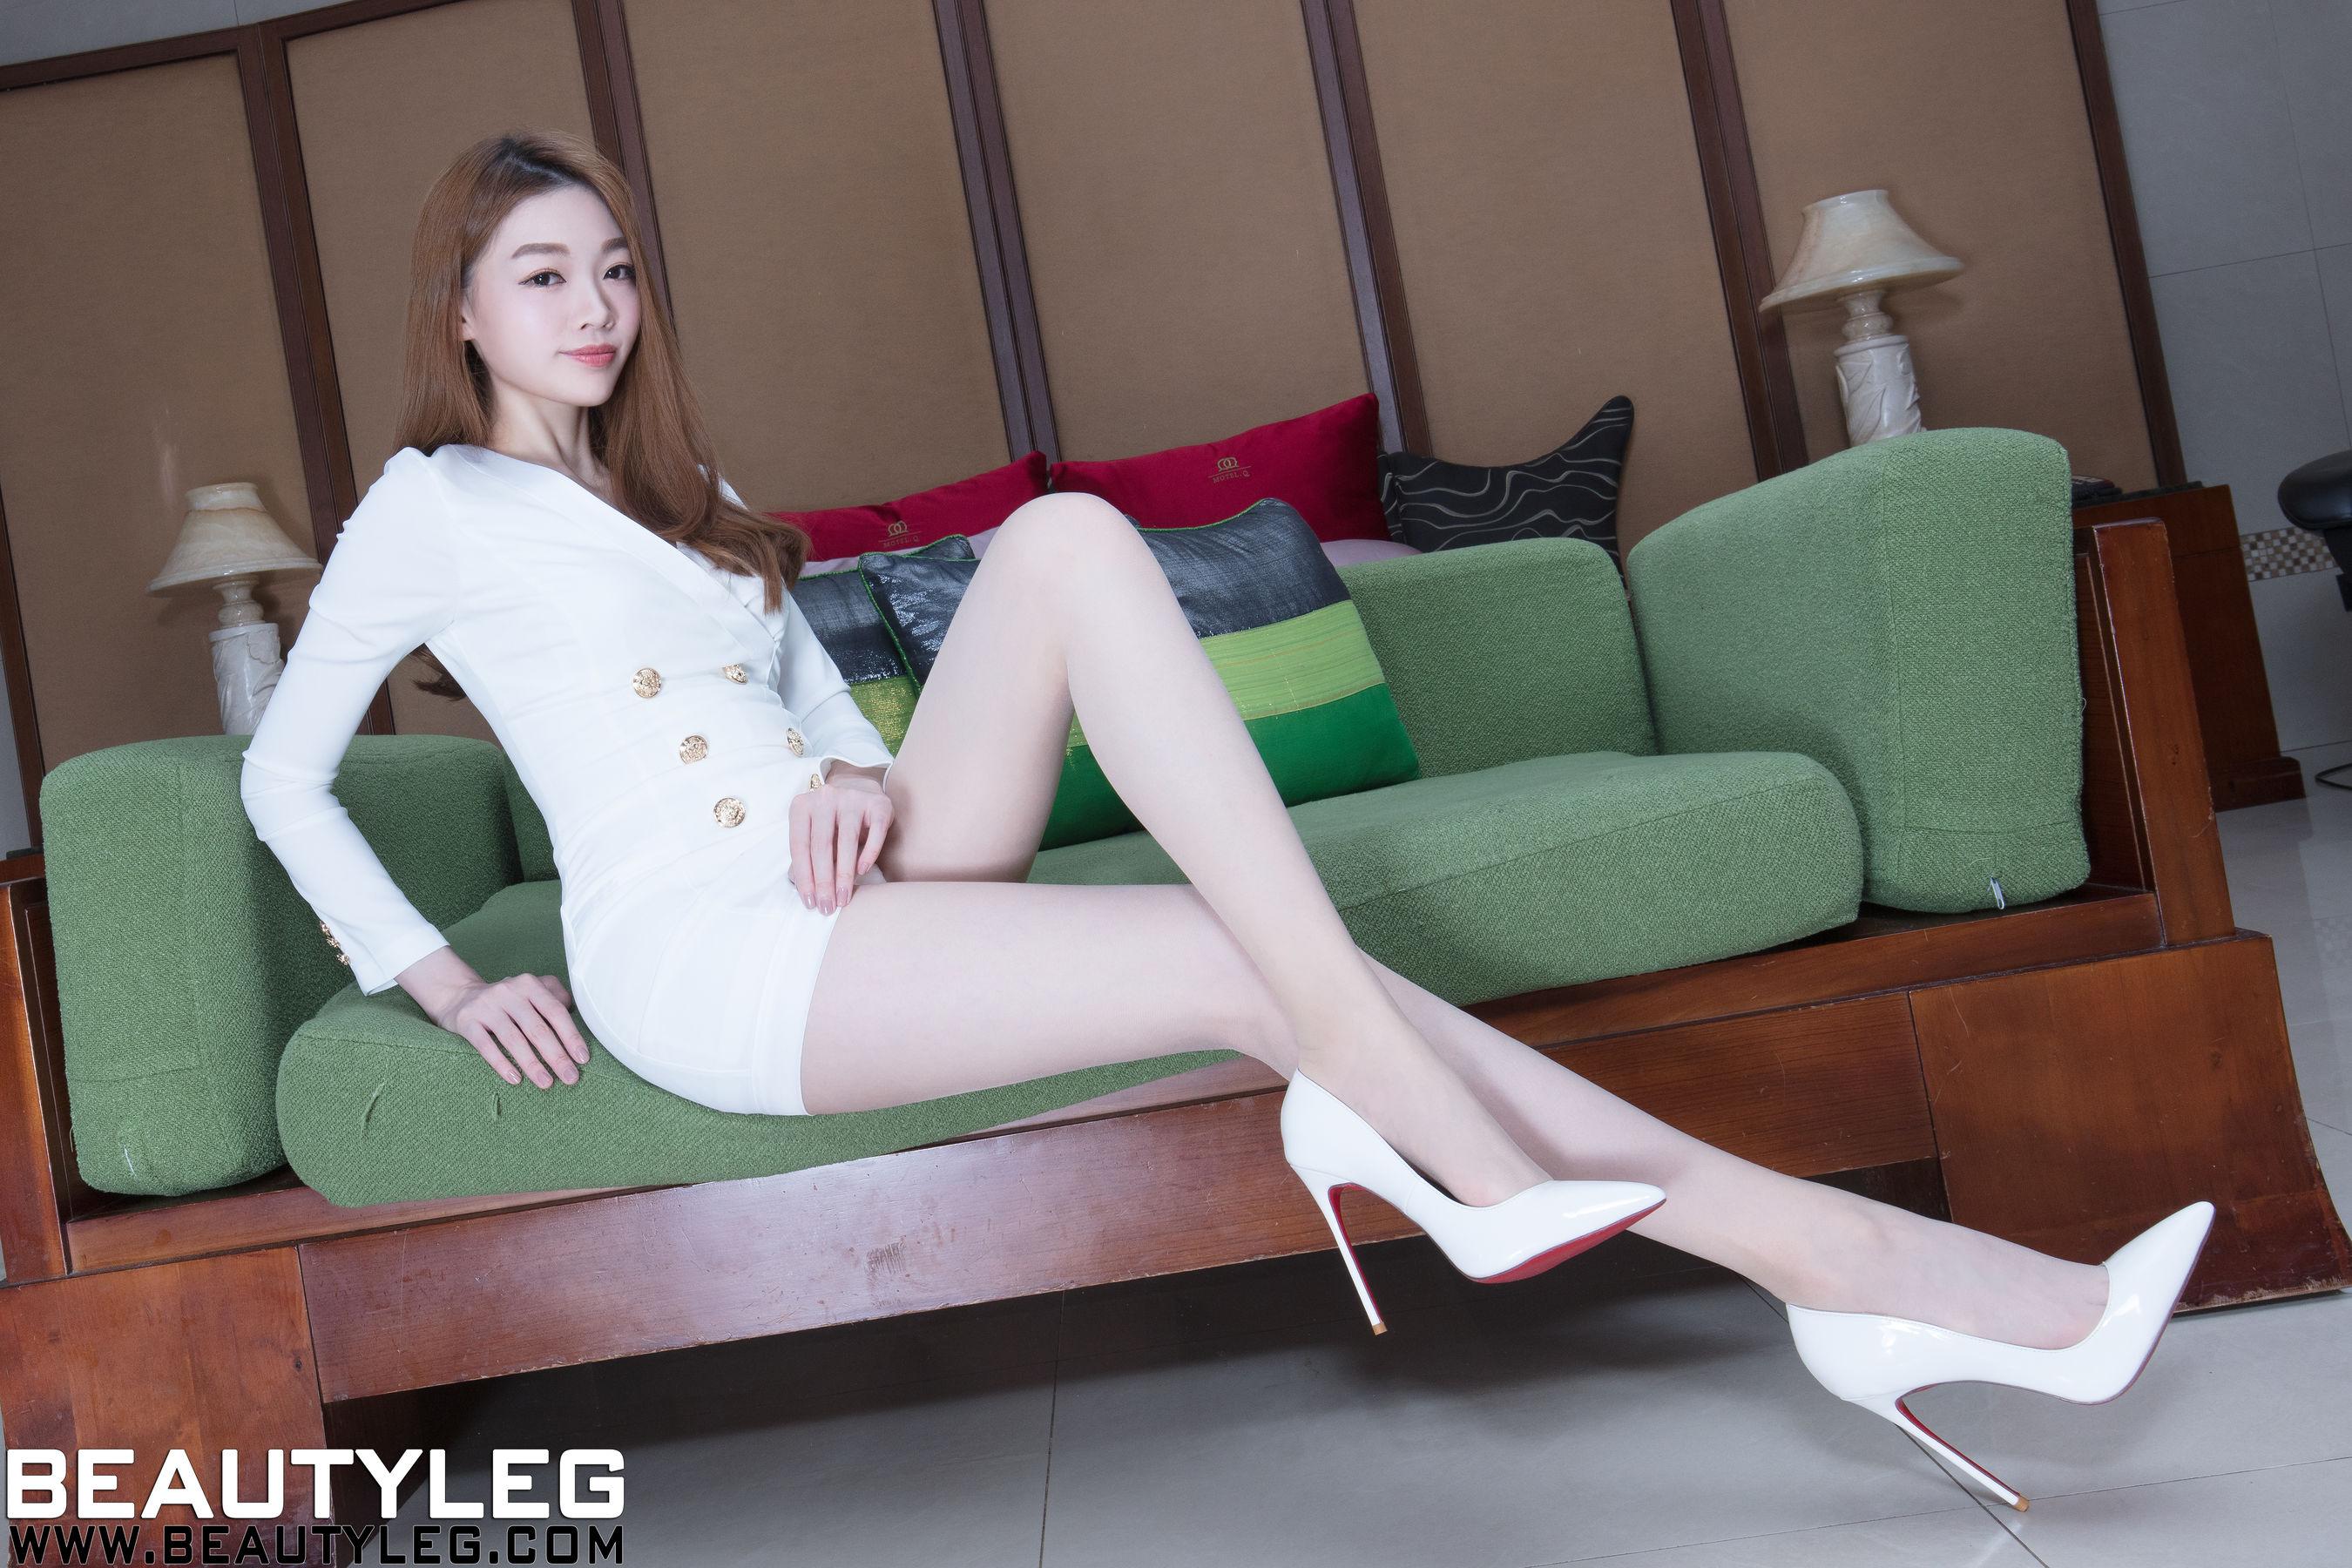 VOL.1642 [Beautyleg]制服丝袜美腿长腿美女:腿模Joanna高品质写真套图(52P)